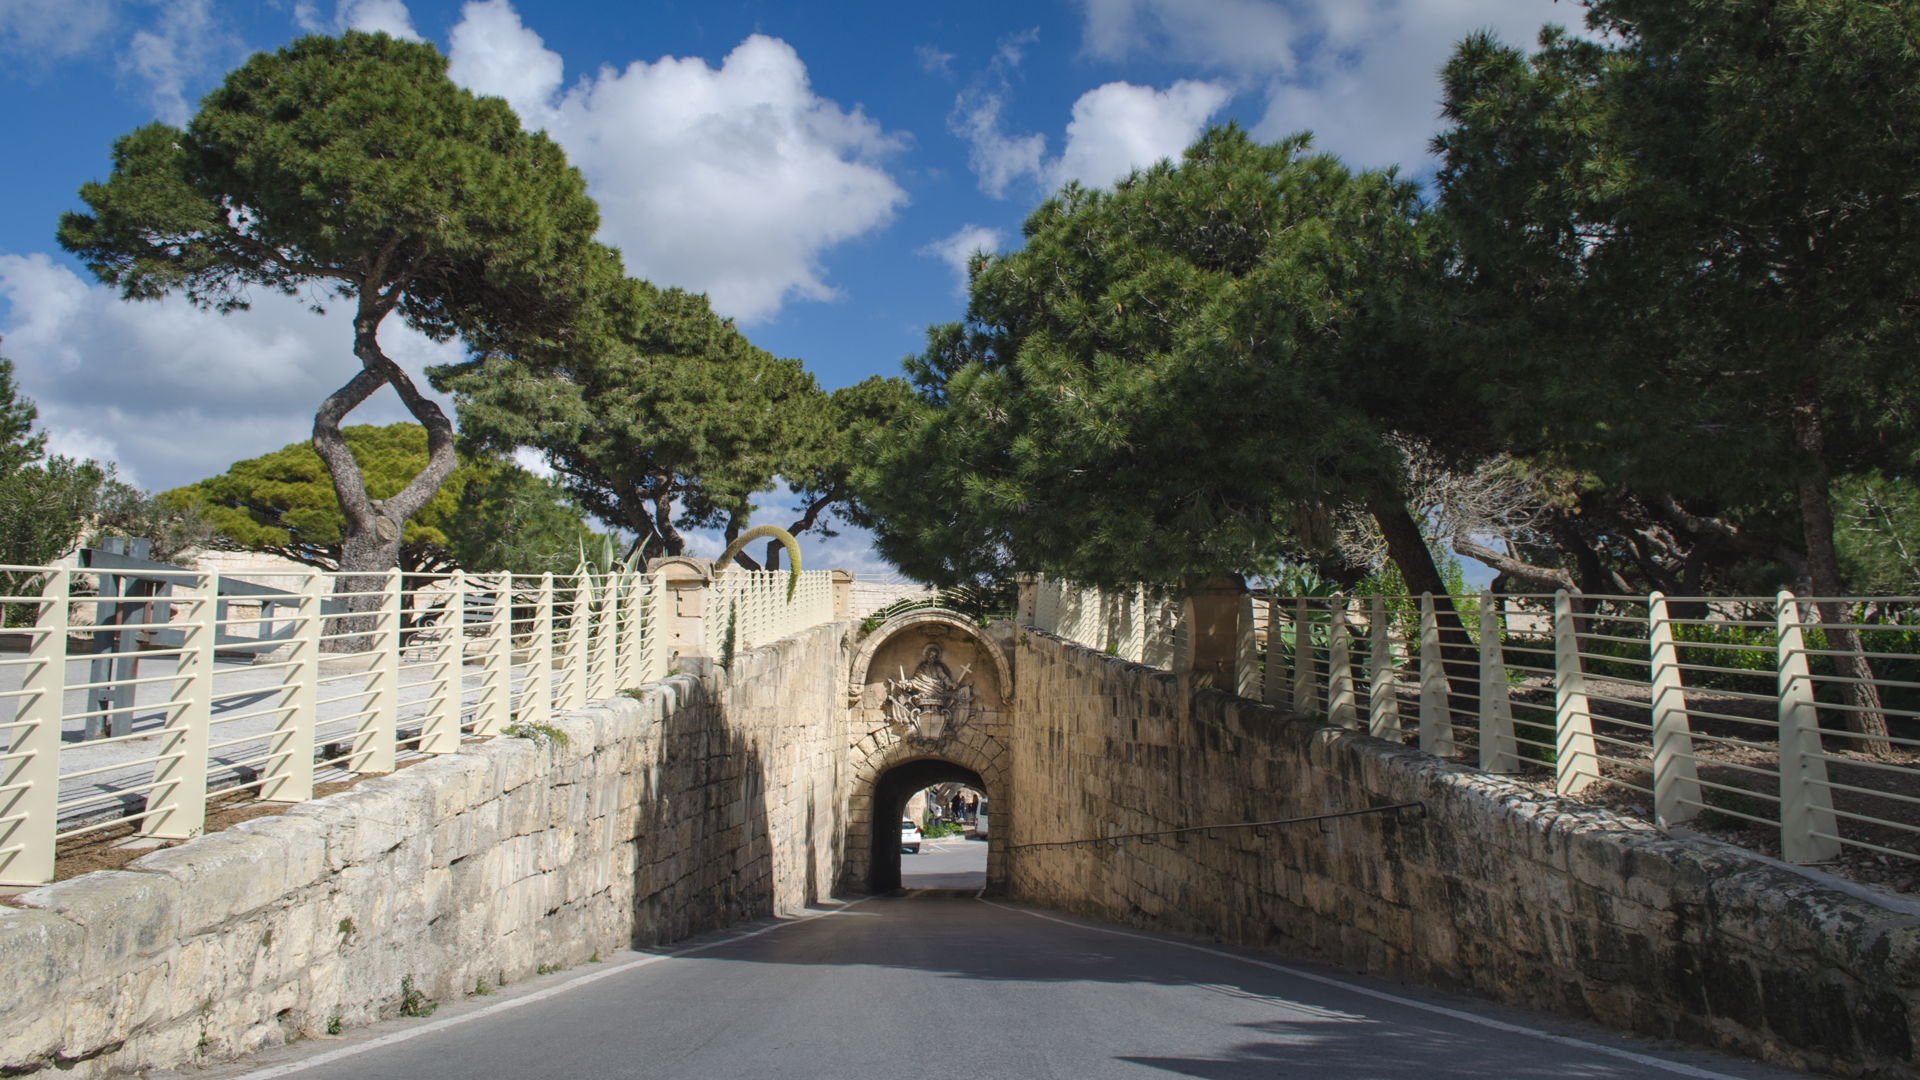 beautiful malta, best of malta, best picture malta, best photo malta, malta representative photo